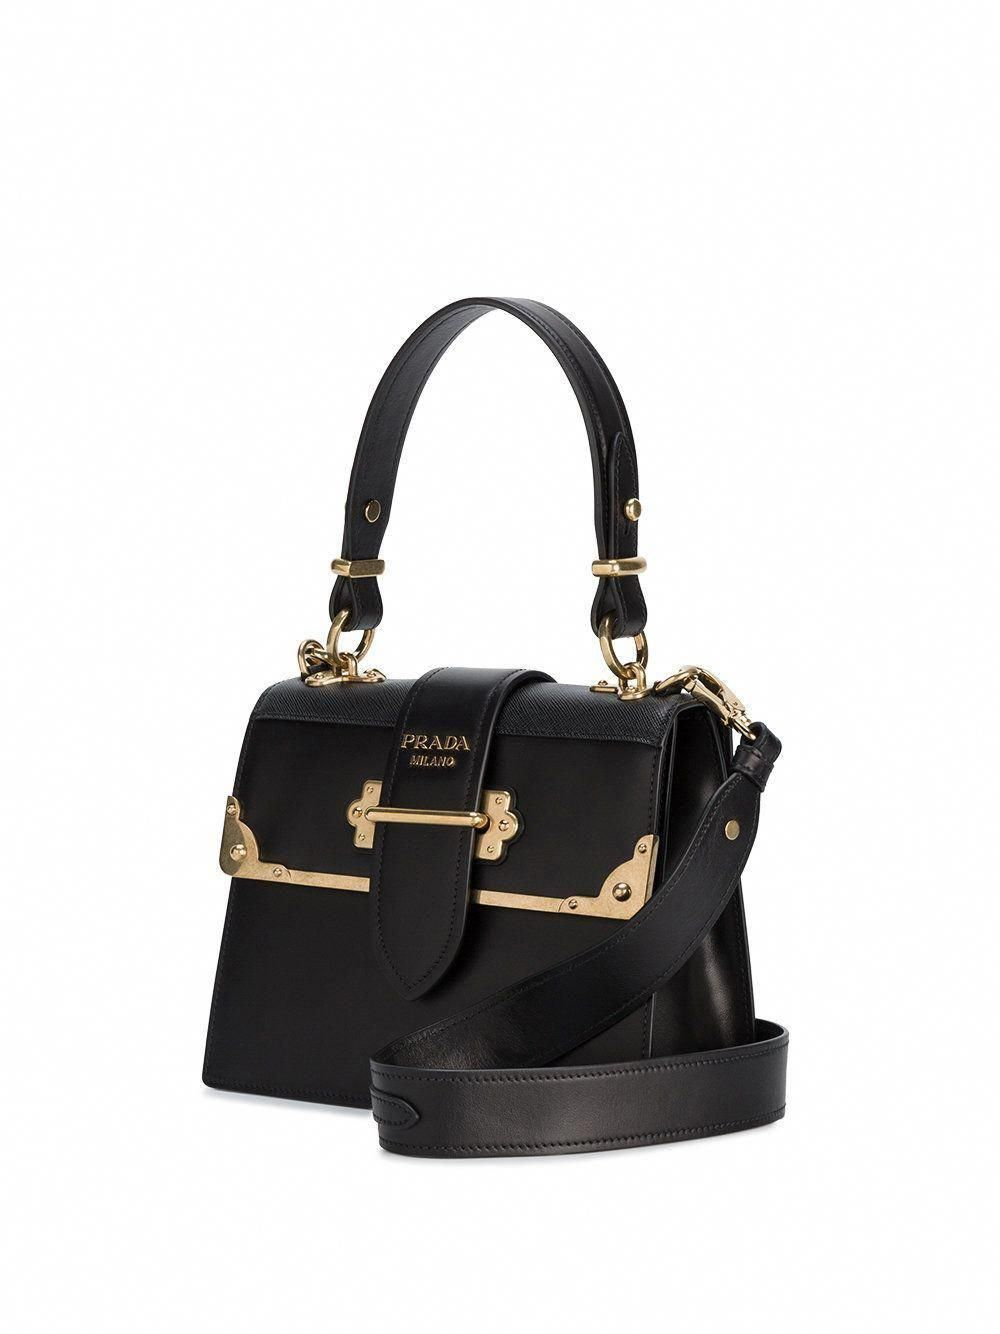 87265363356b Prada cahier medium leather tote #Pradahandbags | Prada Bags, Shoes ...